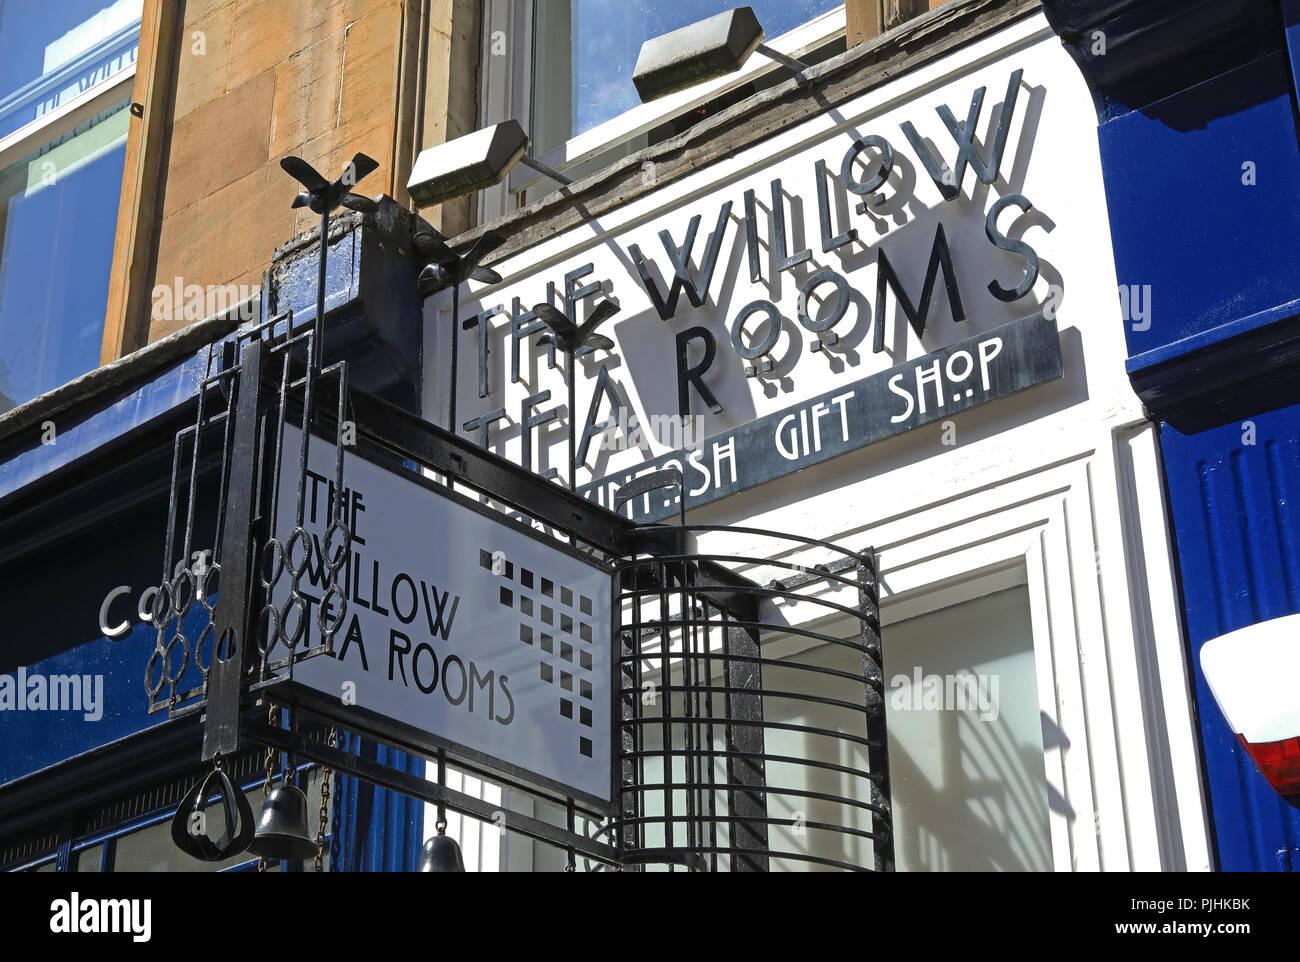 The original Willow Tea Room, designed by Charles Rennie Mackintosh, on Sauchiehall Street, Glasgow, UK - Stock Image